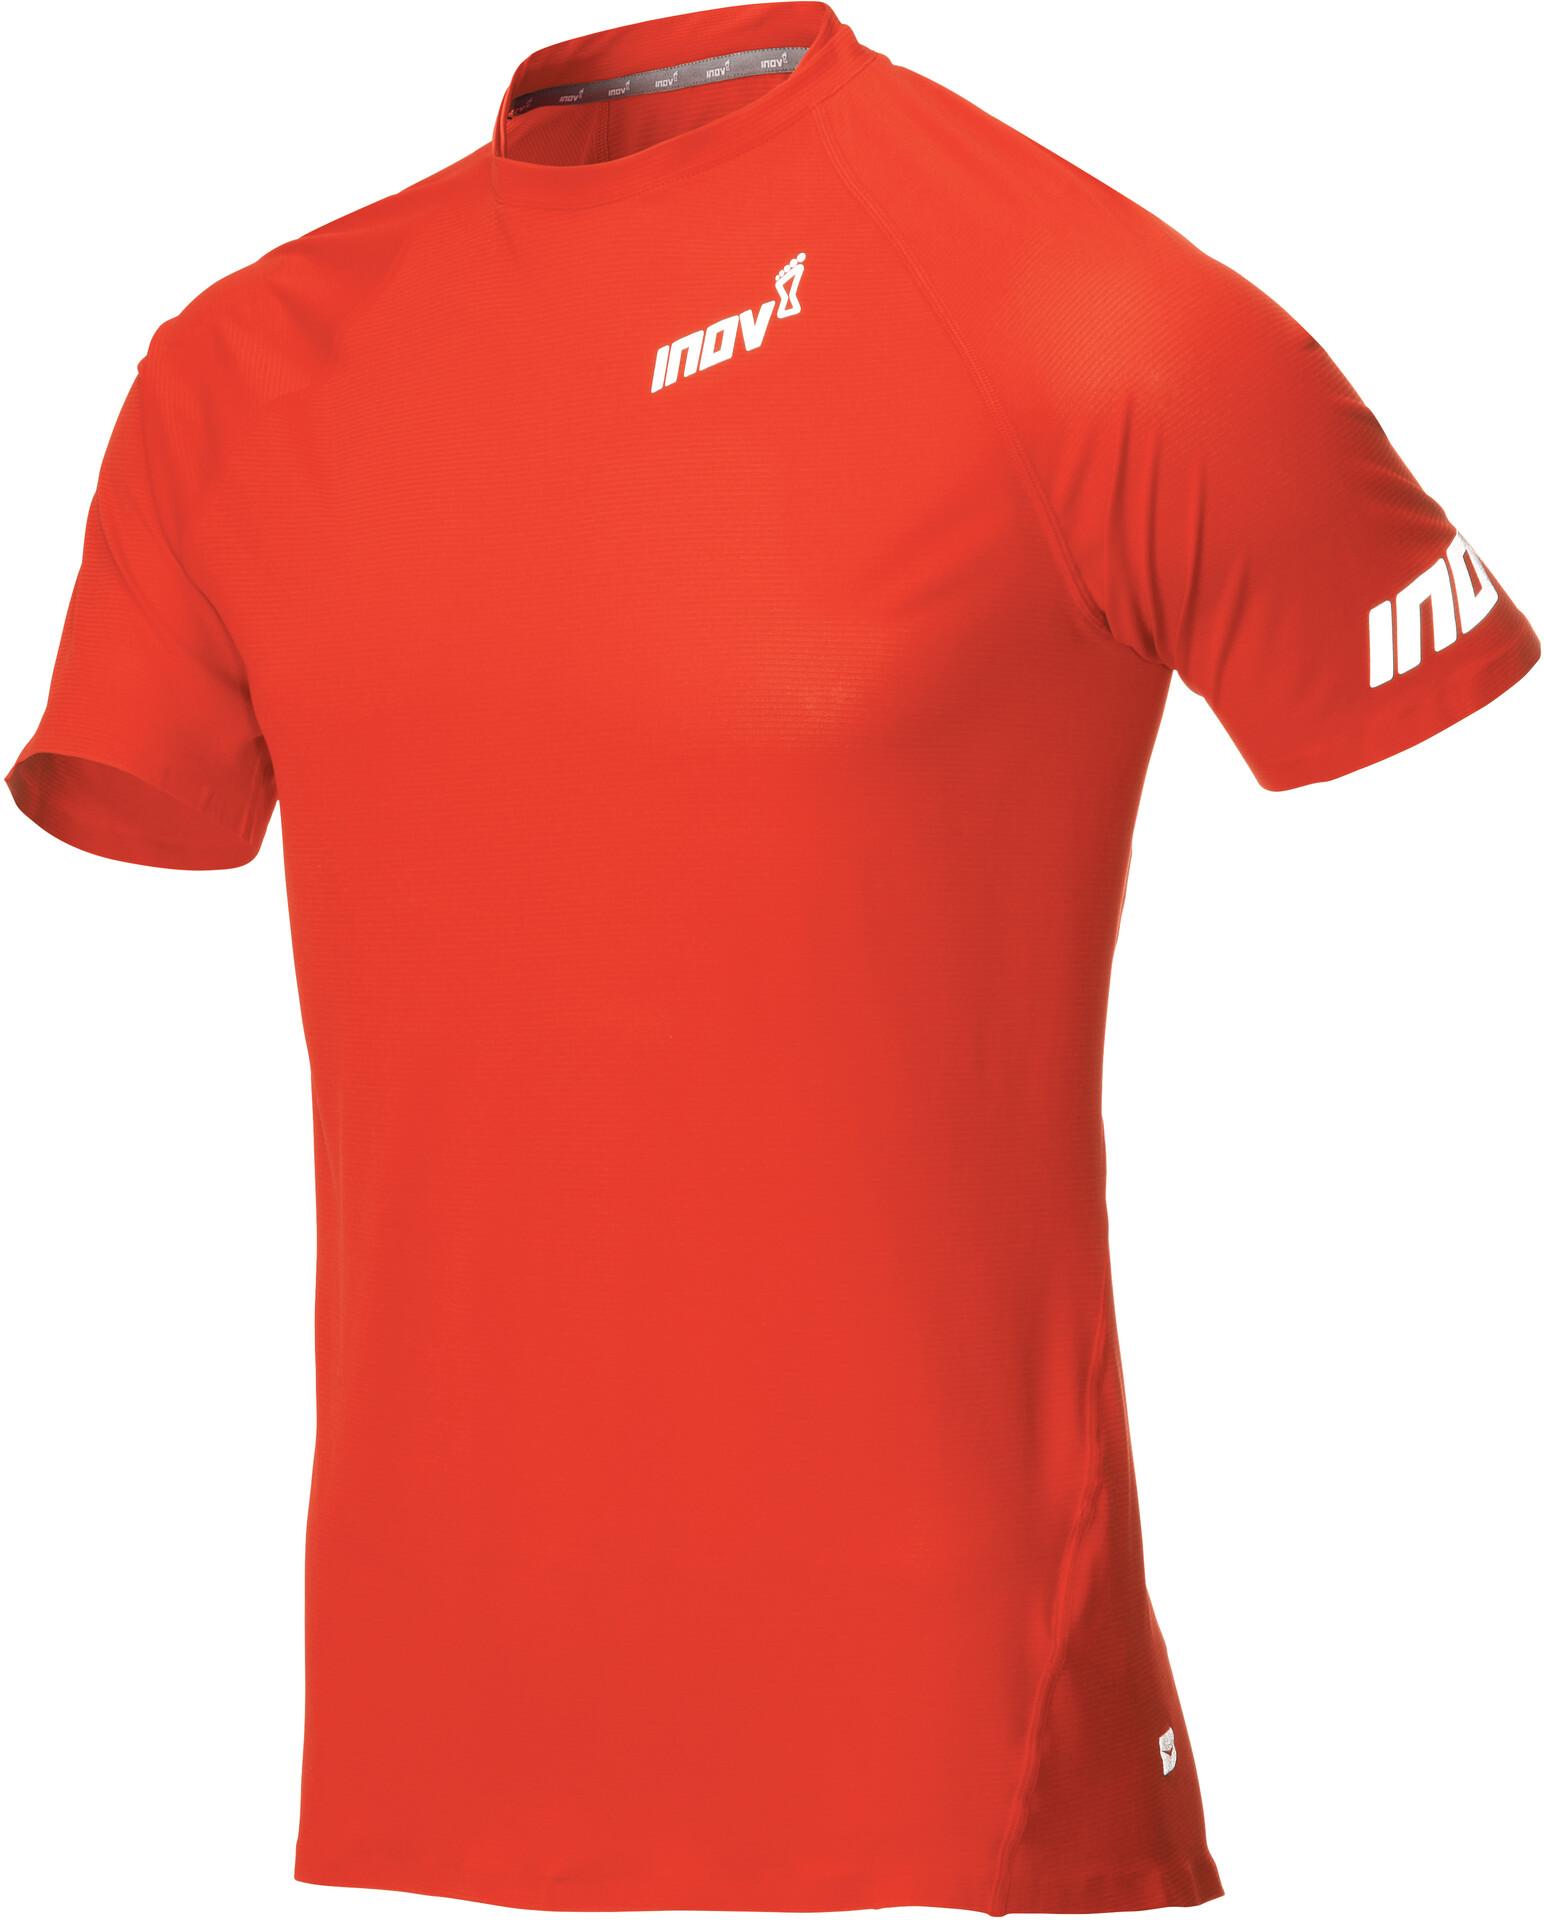 inov 8 Base Elite Camiseta Manga Corta Hombre, red | Campz.es